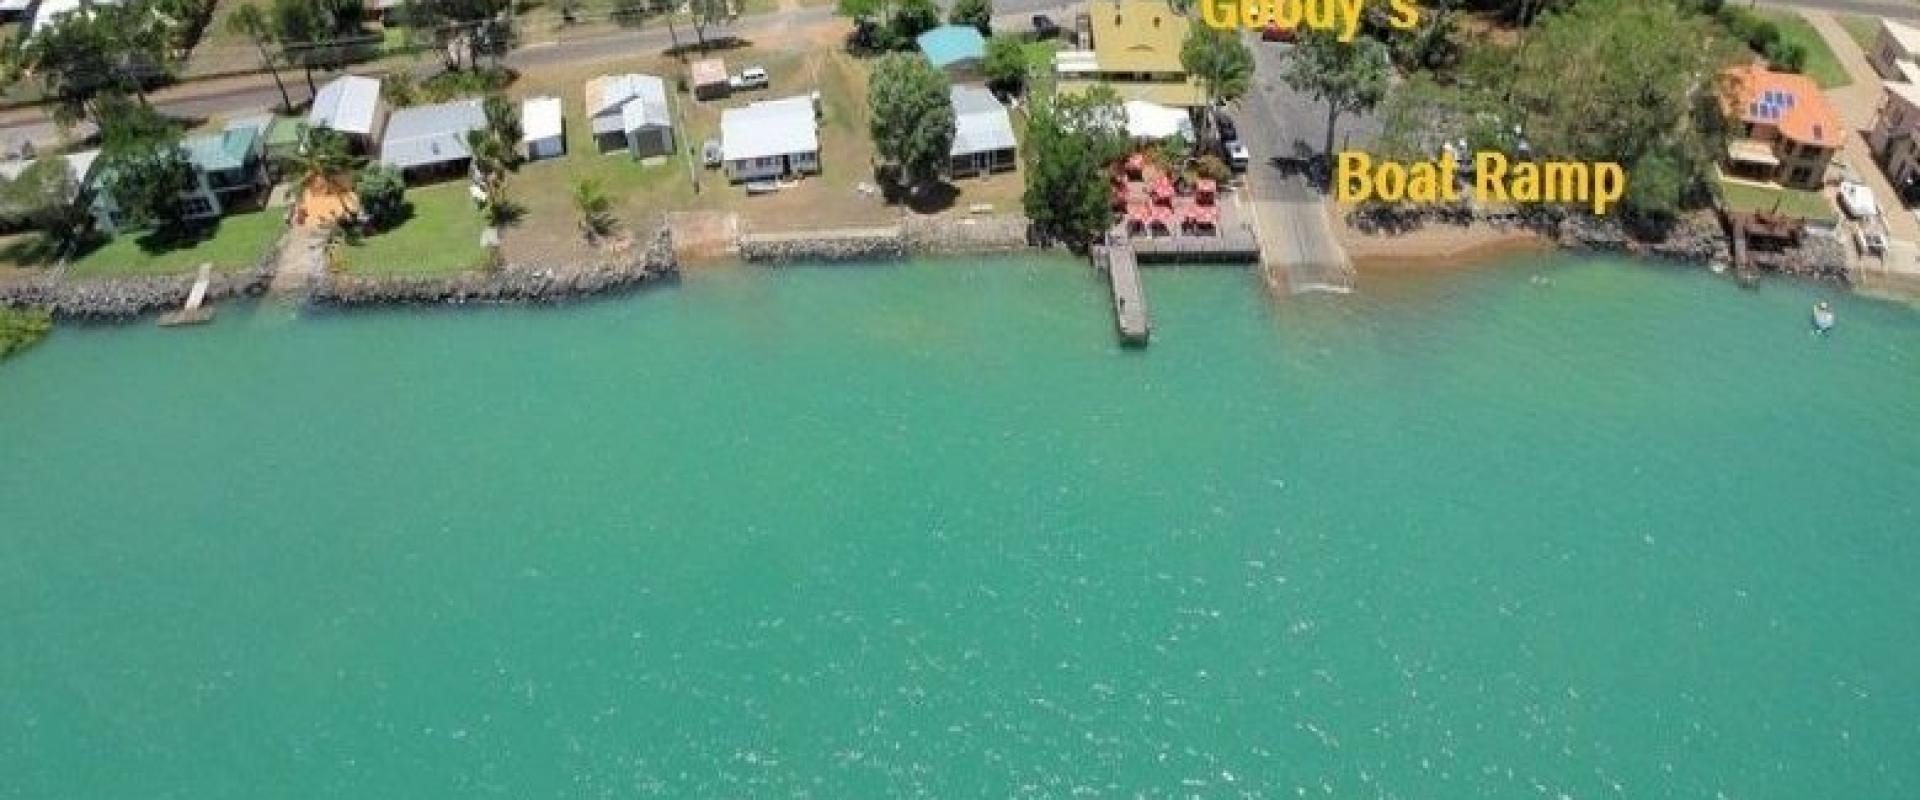 nearby Toogoom boat ramp